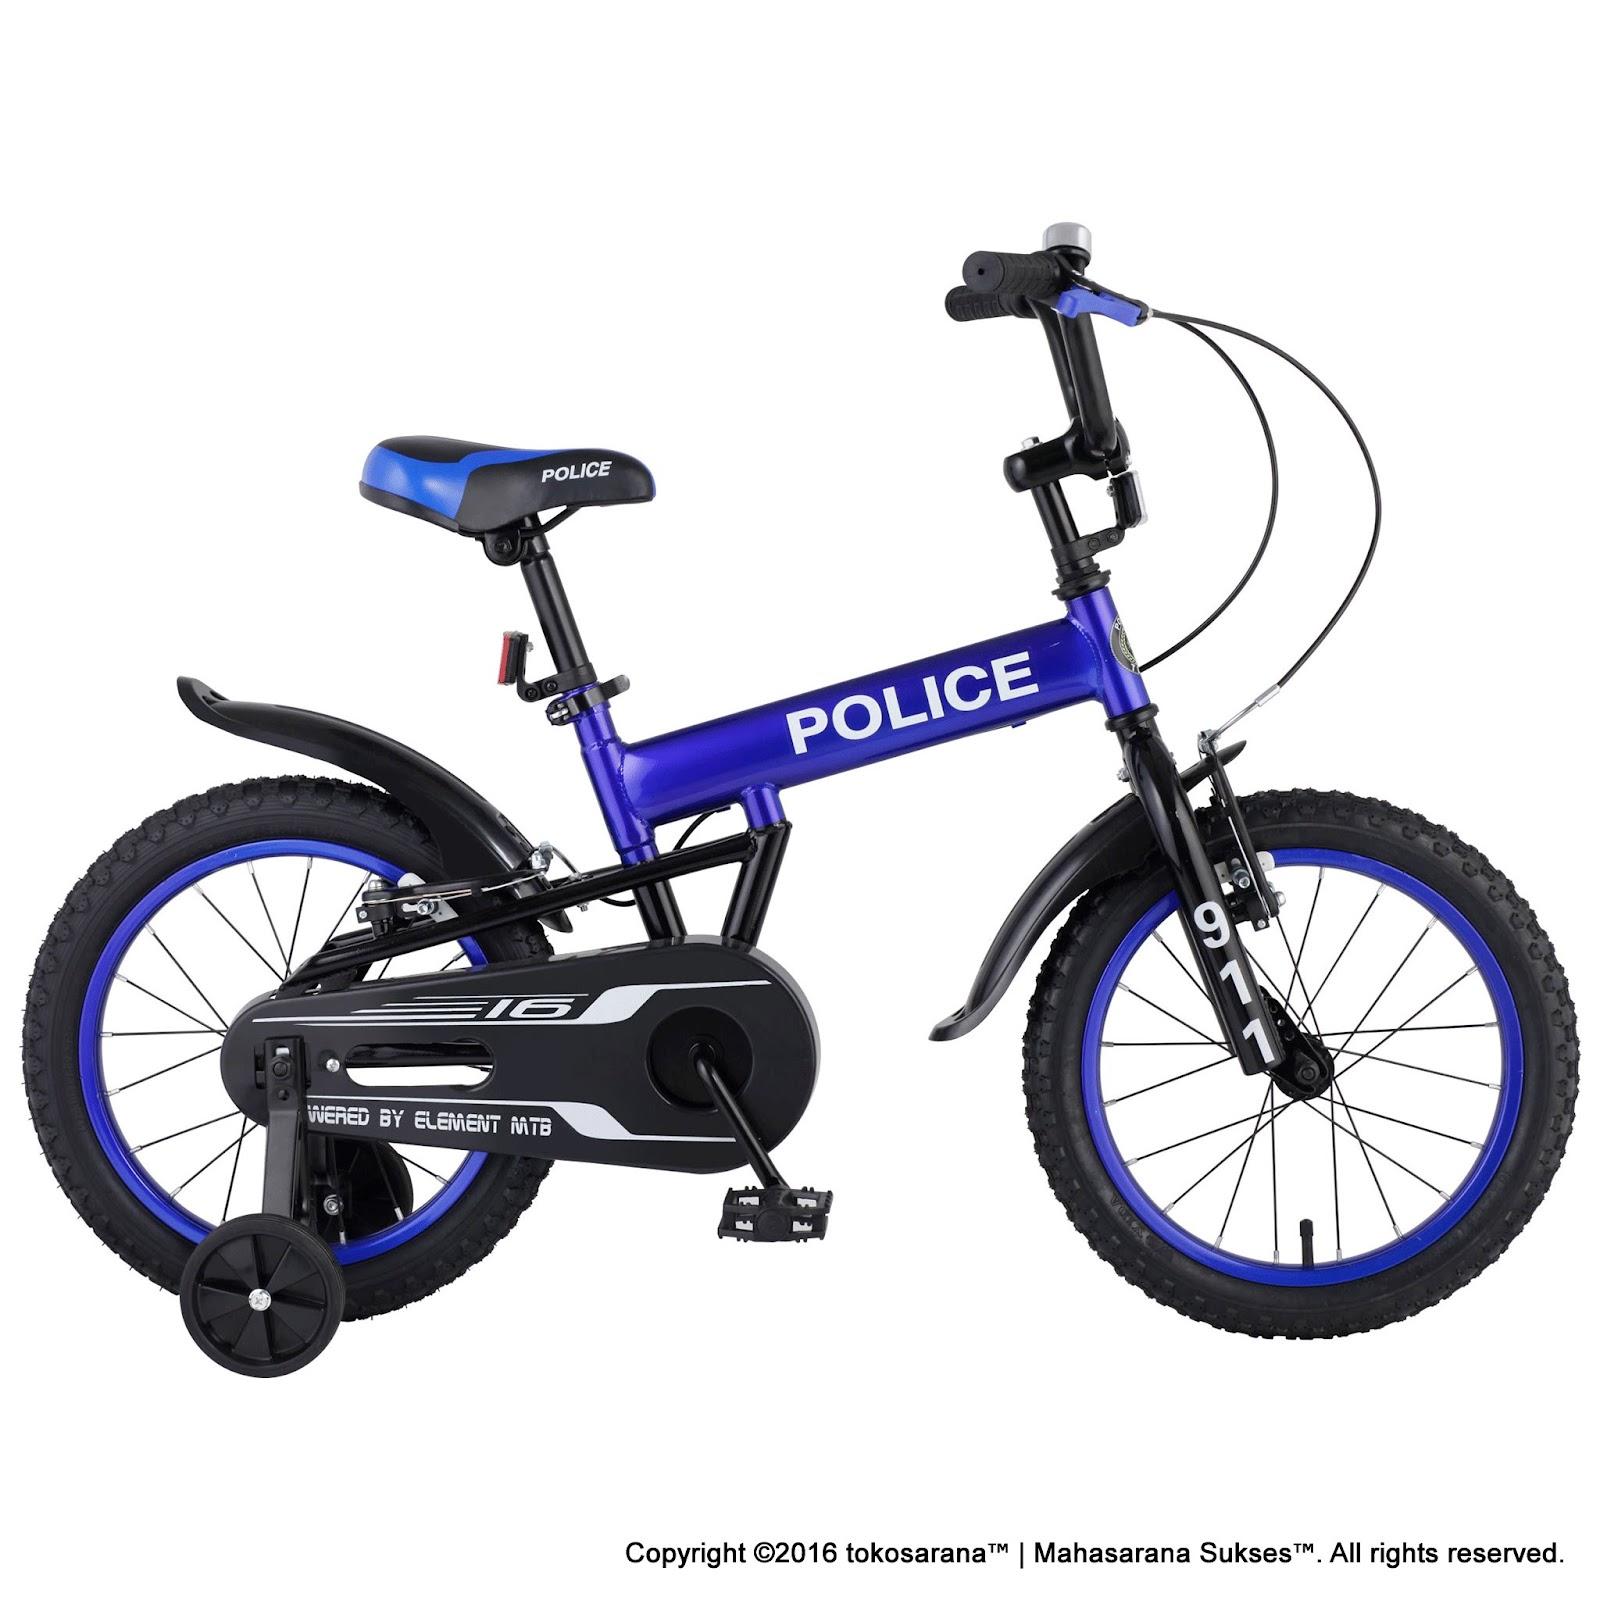 tokosarana™ | Mahasarana Sukses™: Sepeda Anak Element 911